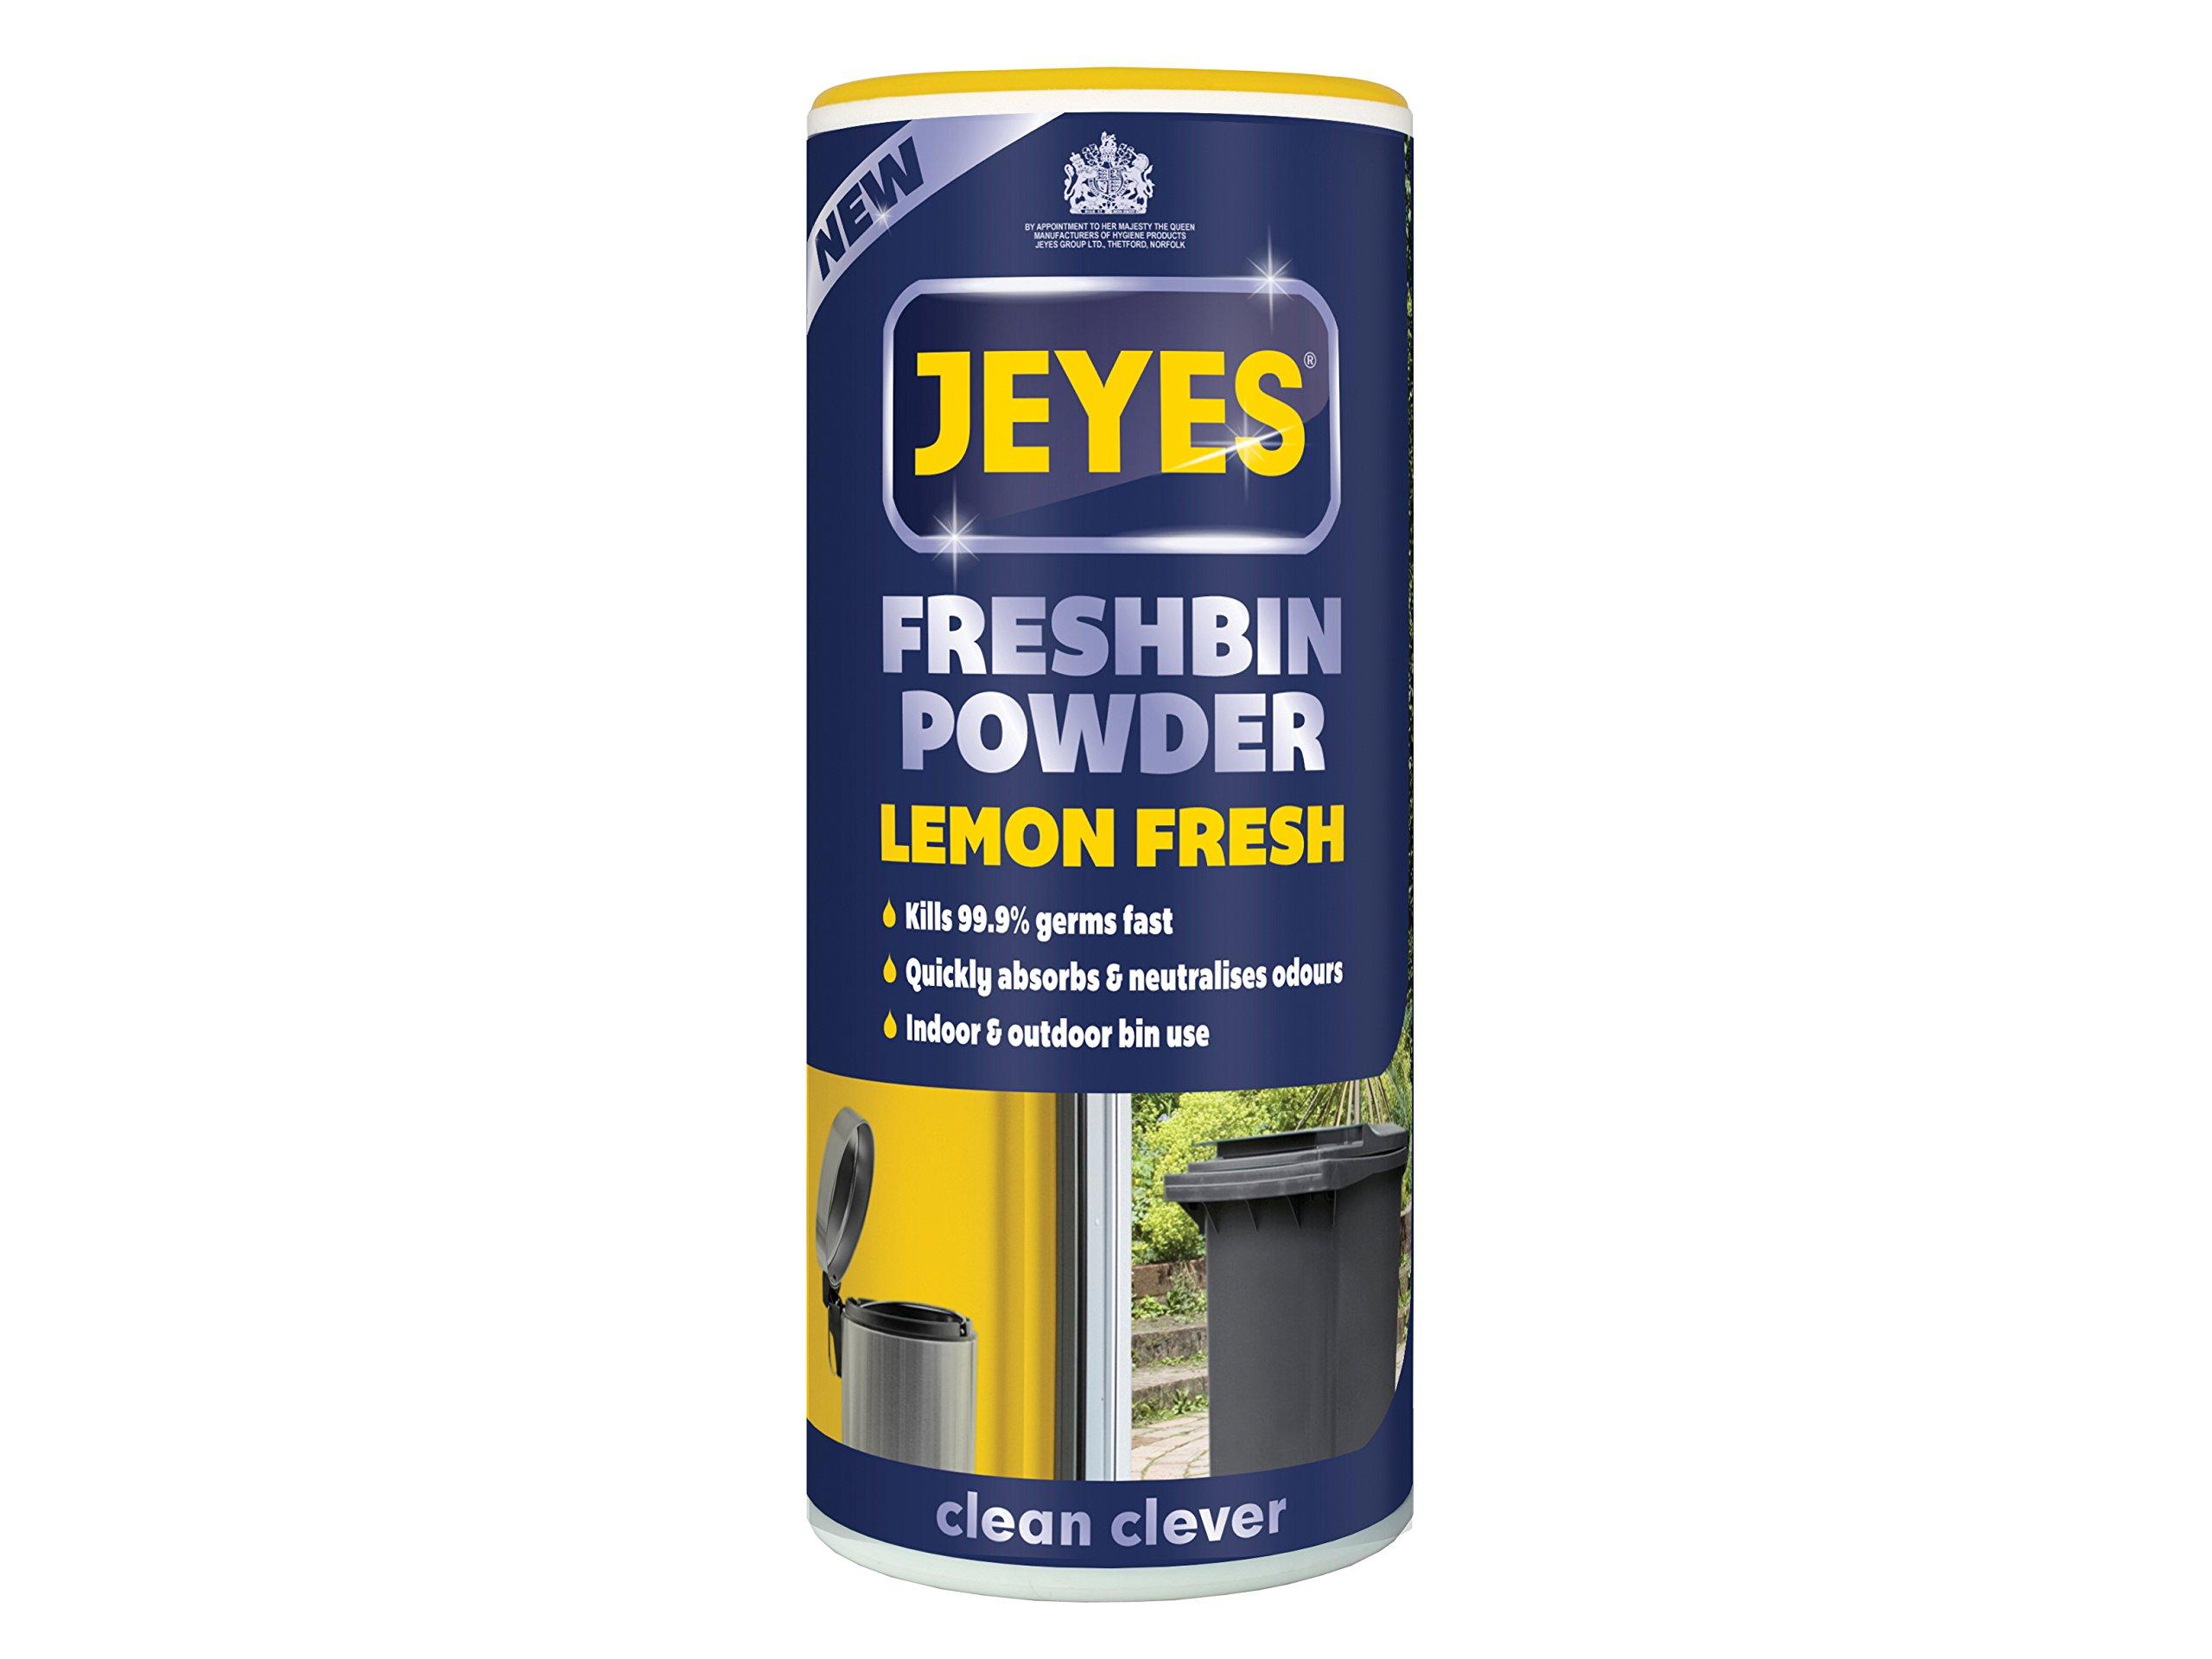 Jeyes Freshbin Disinfectant Powder [Kitchen & Home]